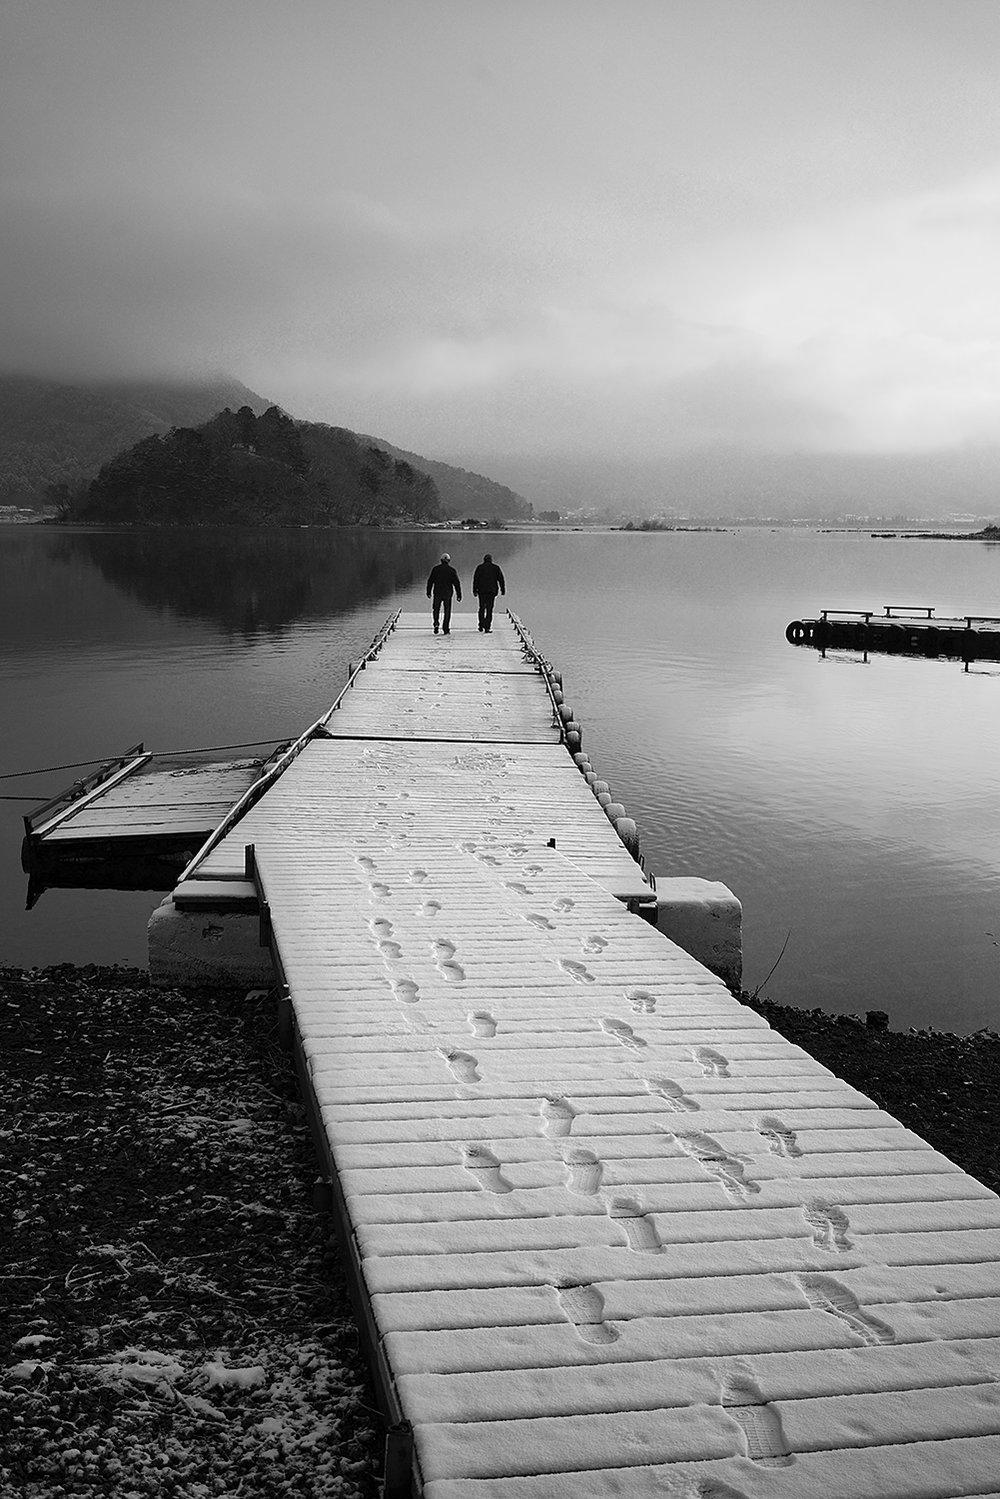 Lake Kawaguchi Nel & Koj00978.jpg